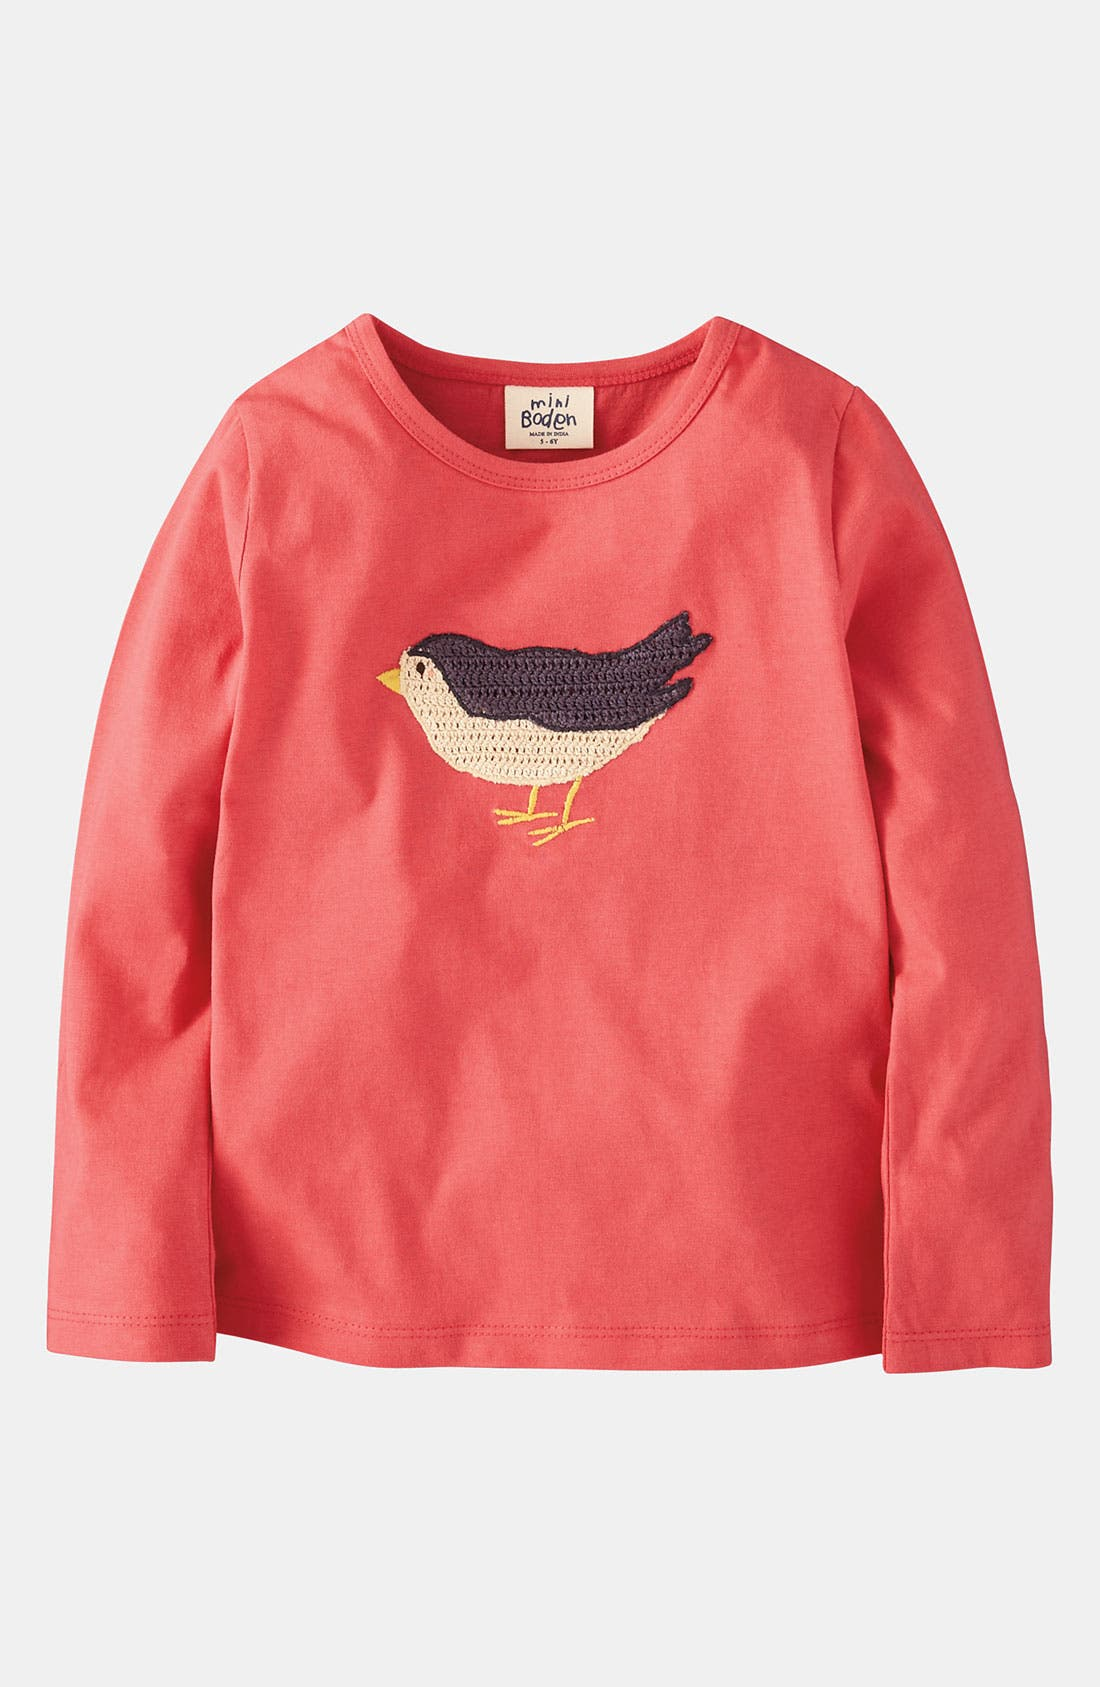 Main Image - Mini Boden 'Crochet' Appliqué Tee (Toddler, Little Girls & Big Girls)